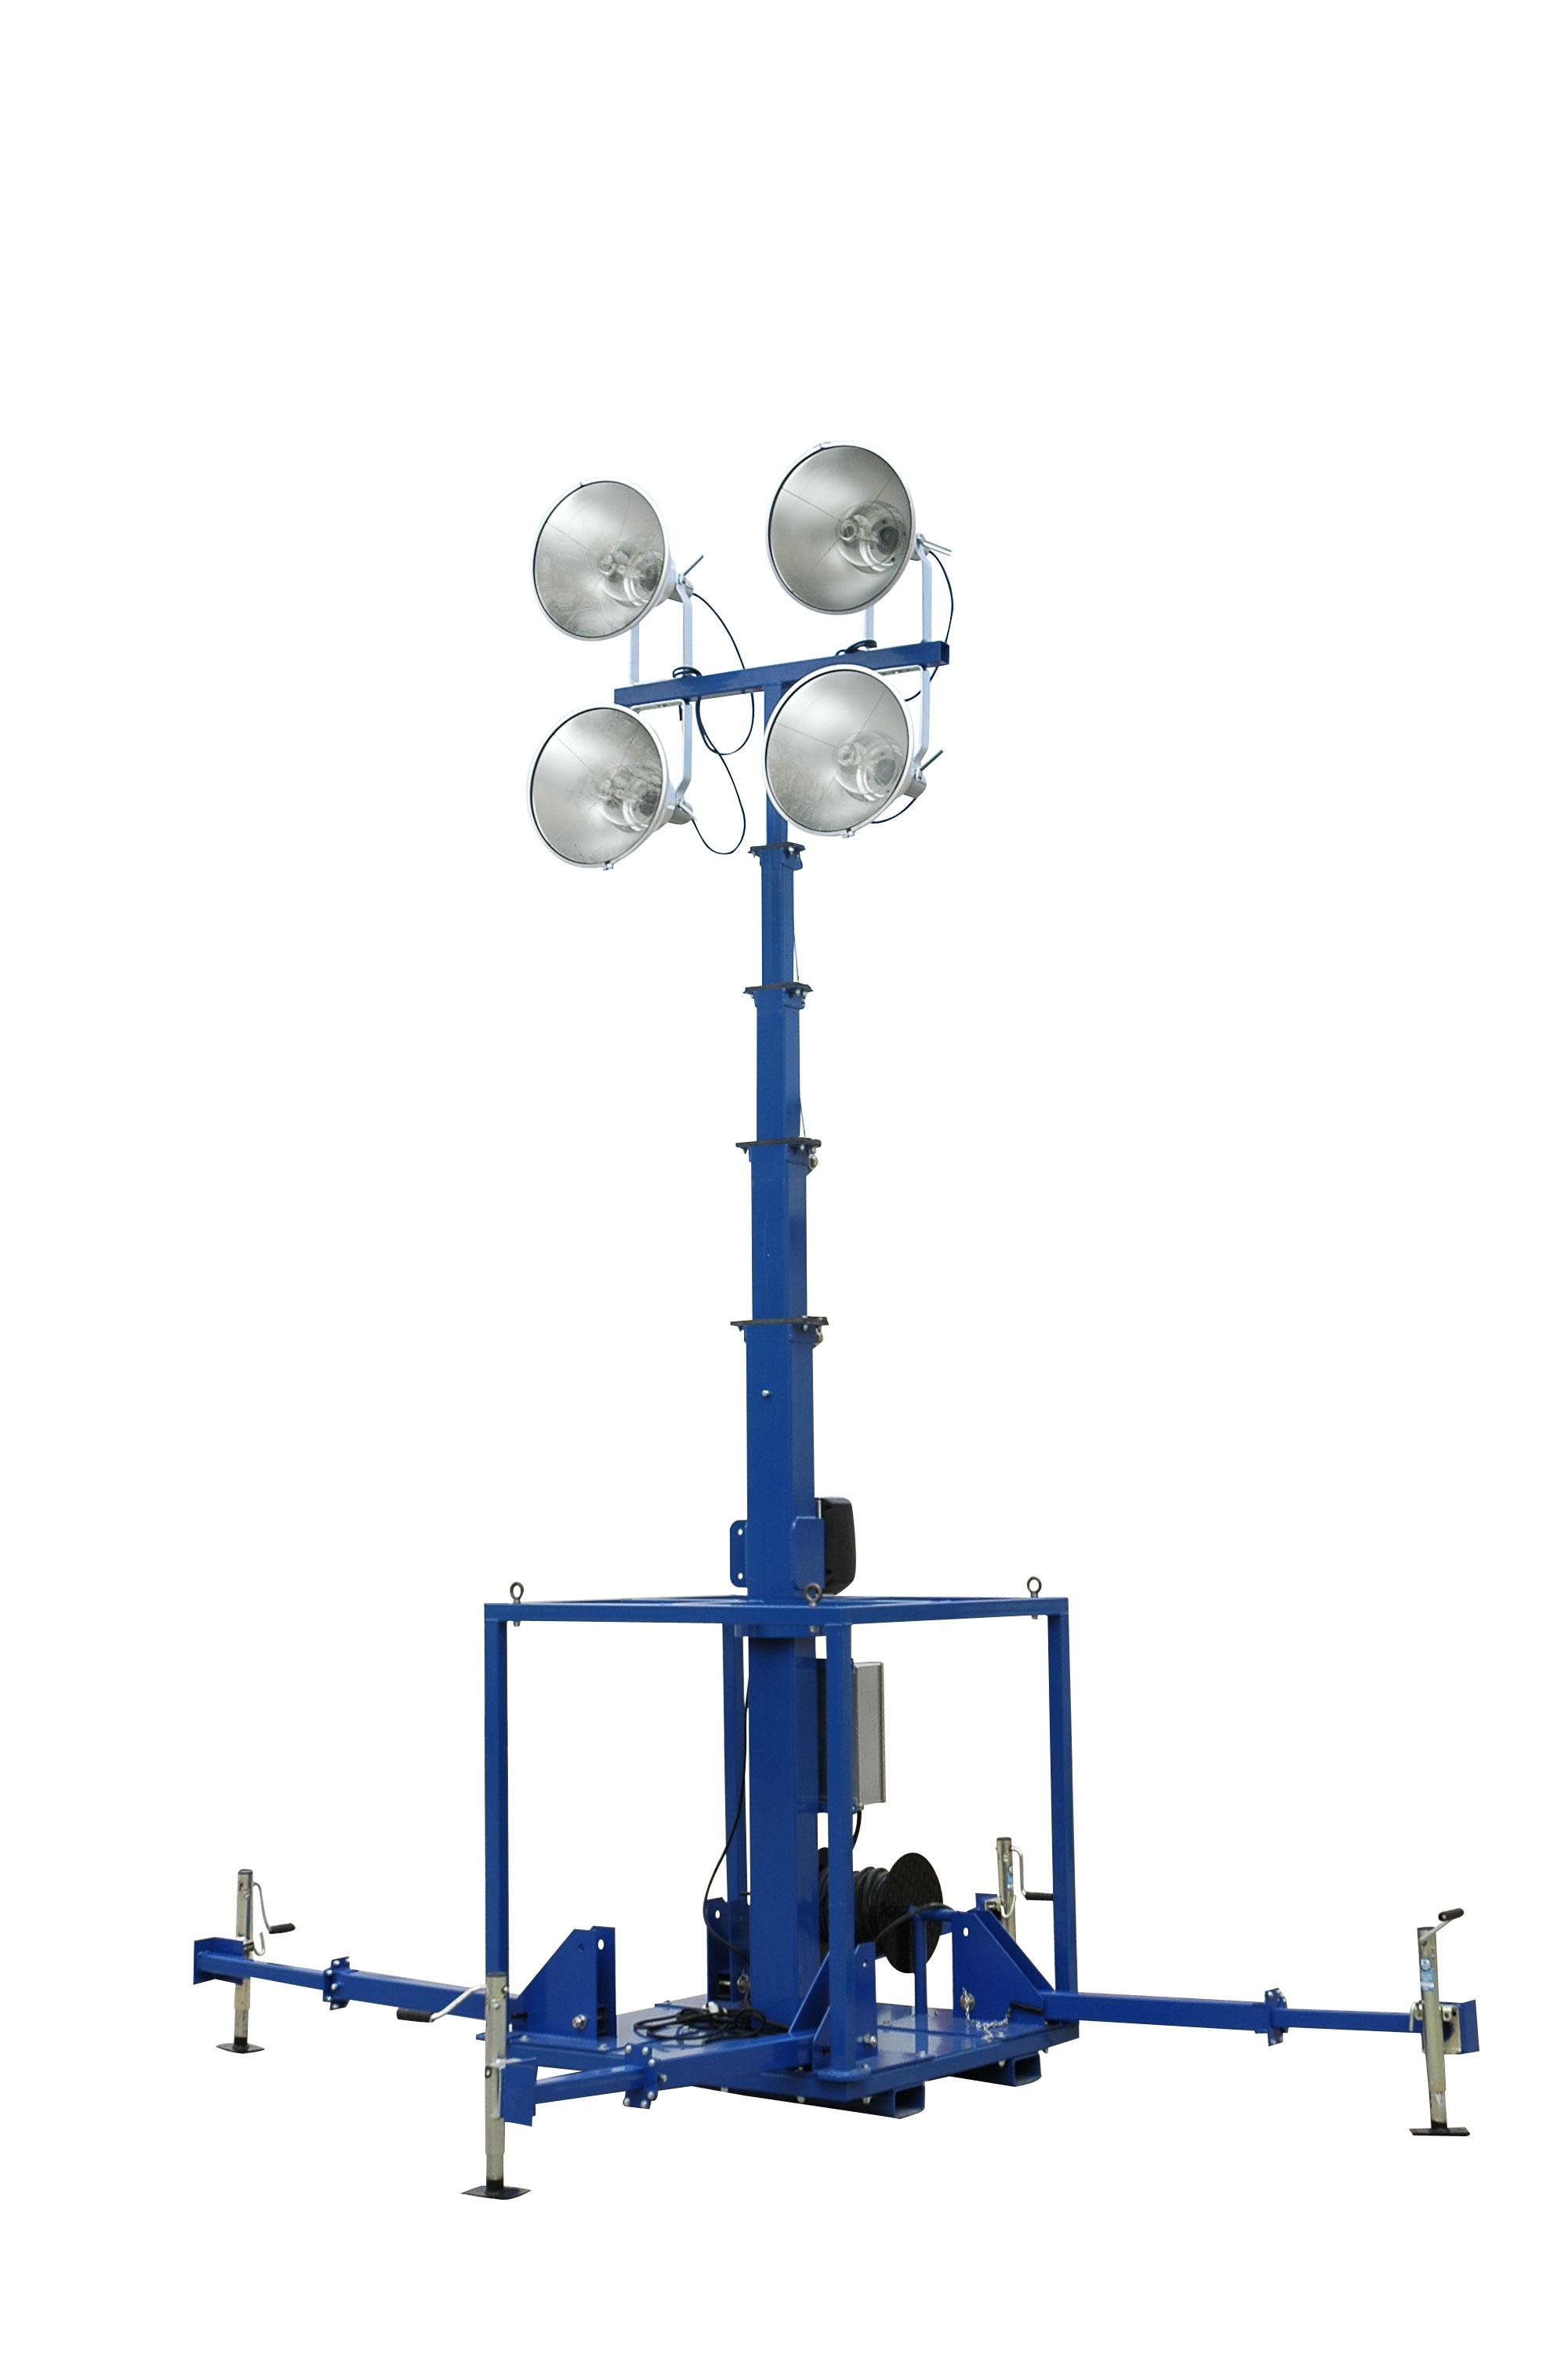 4000 Watt High Intensity Metal Halide Skid Mount Light